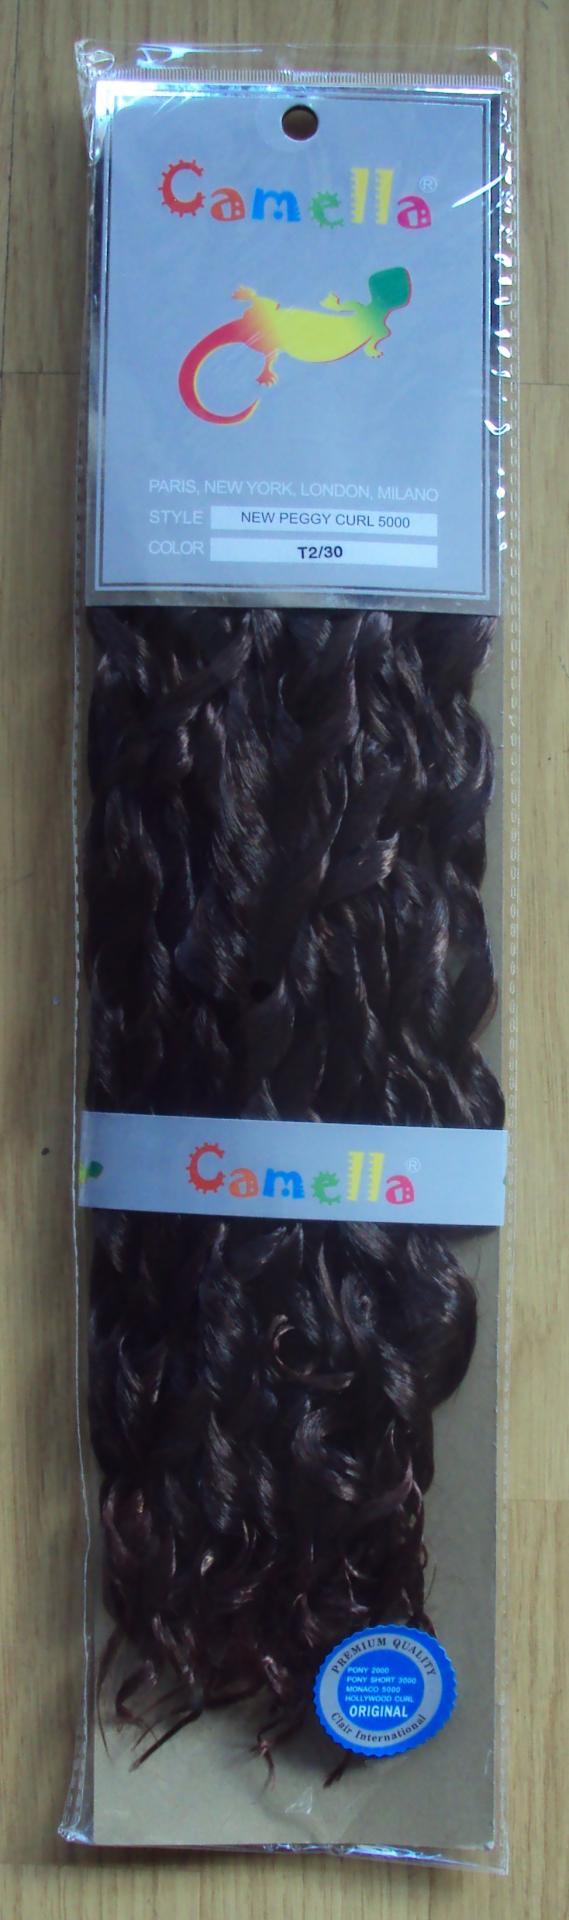 Camella new peggy curl 5000